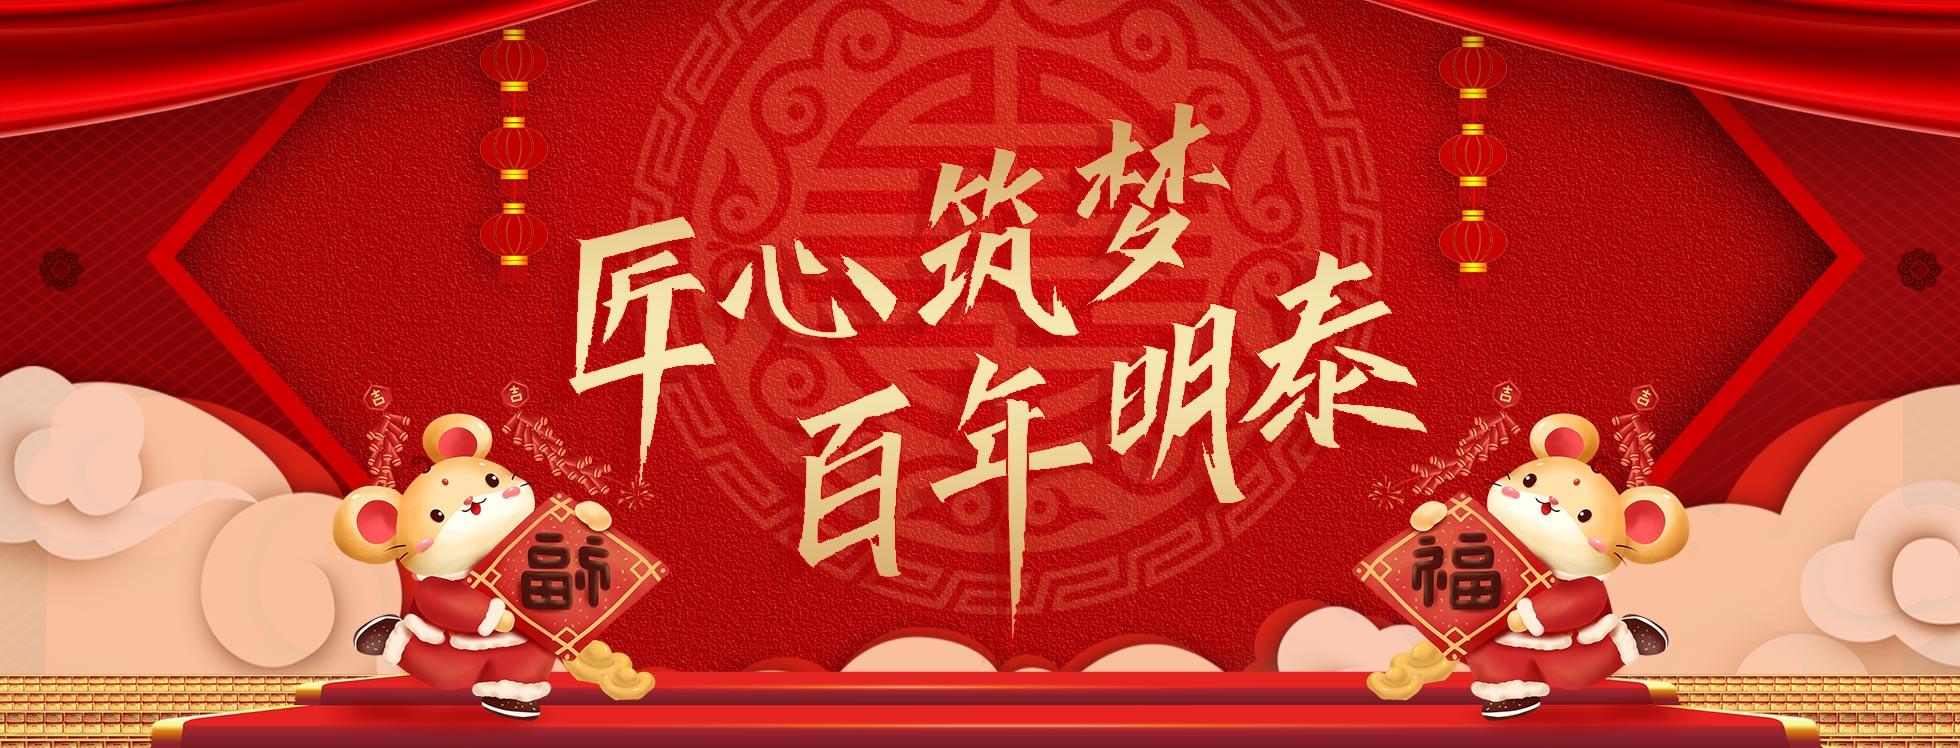 關(guan)于(yu)明泰(tai)